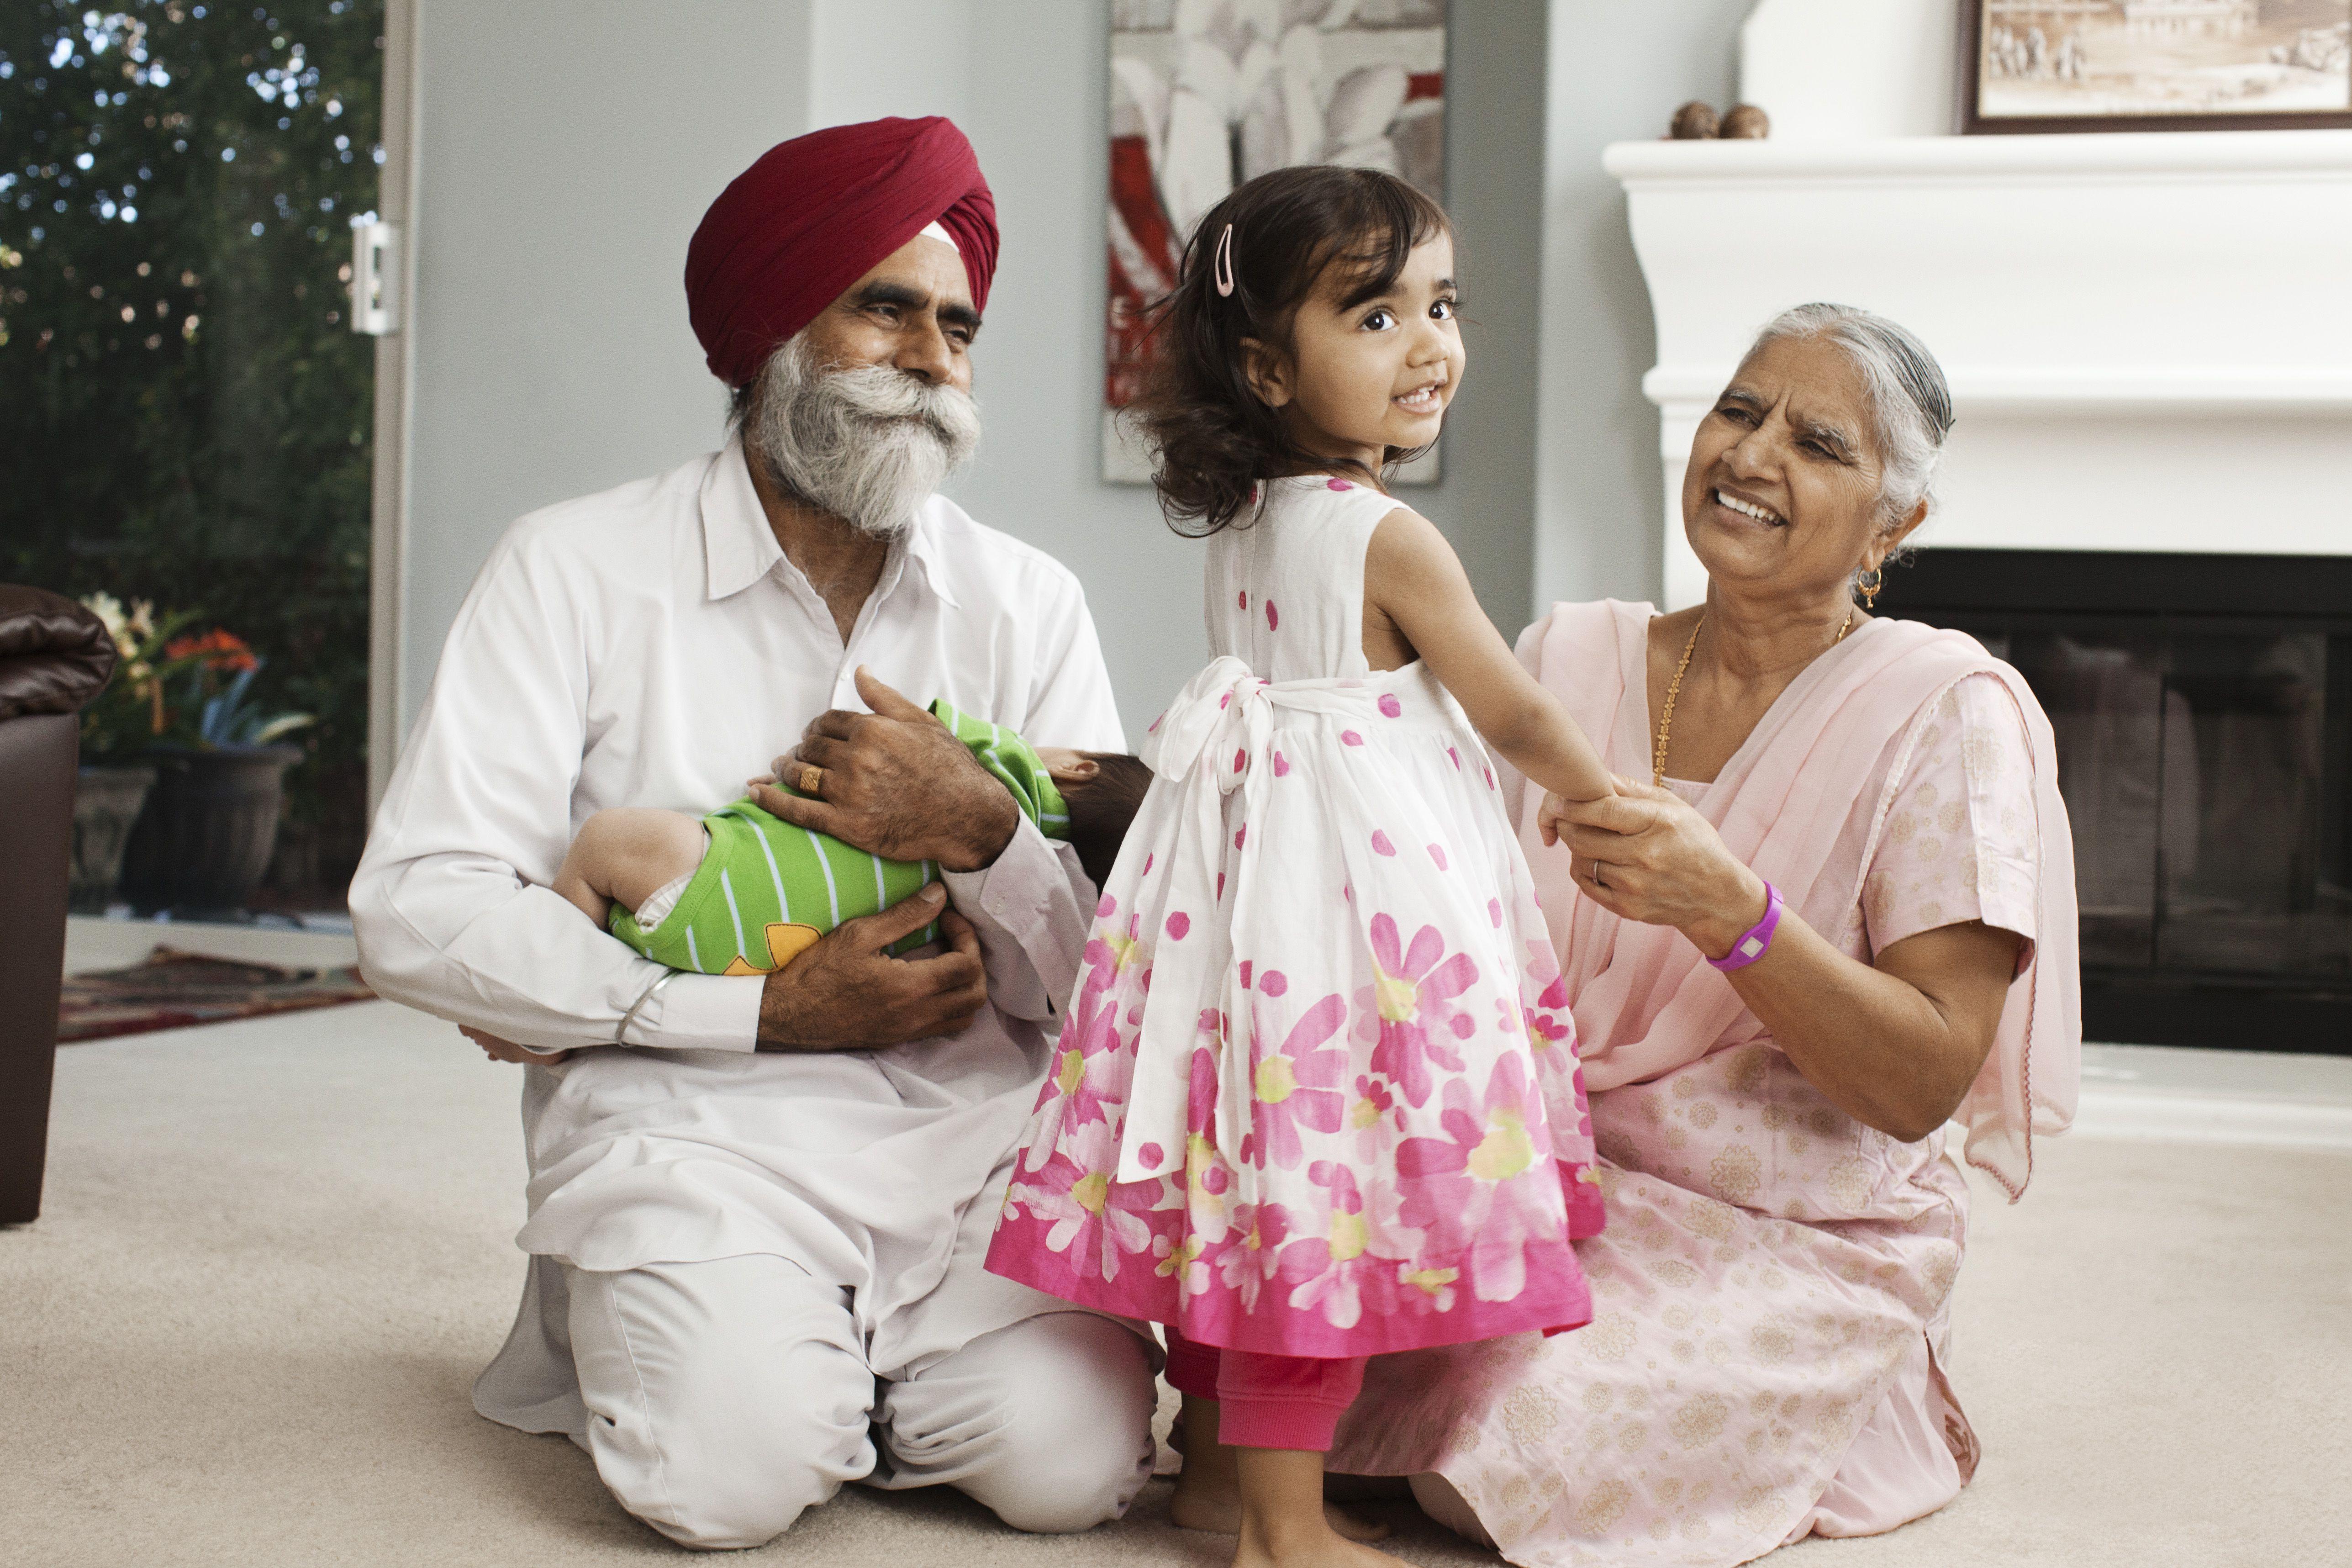 Asian grandparents in living room with grandchildren